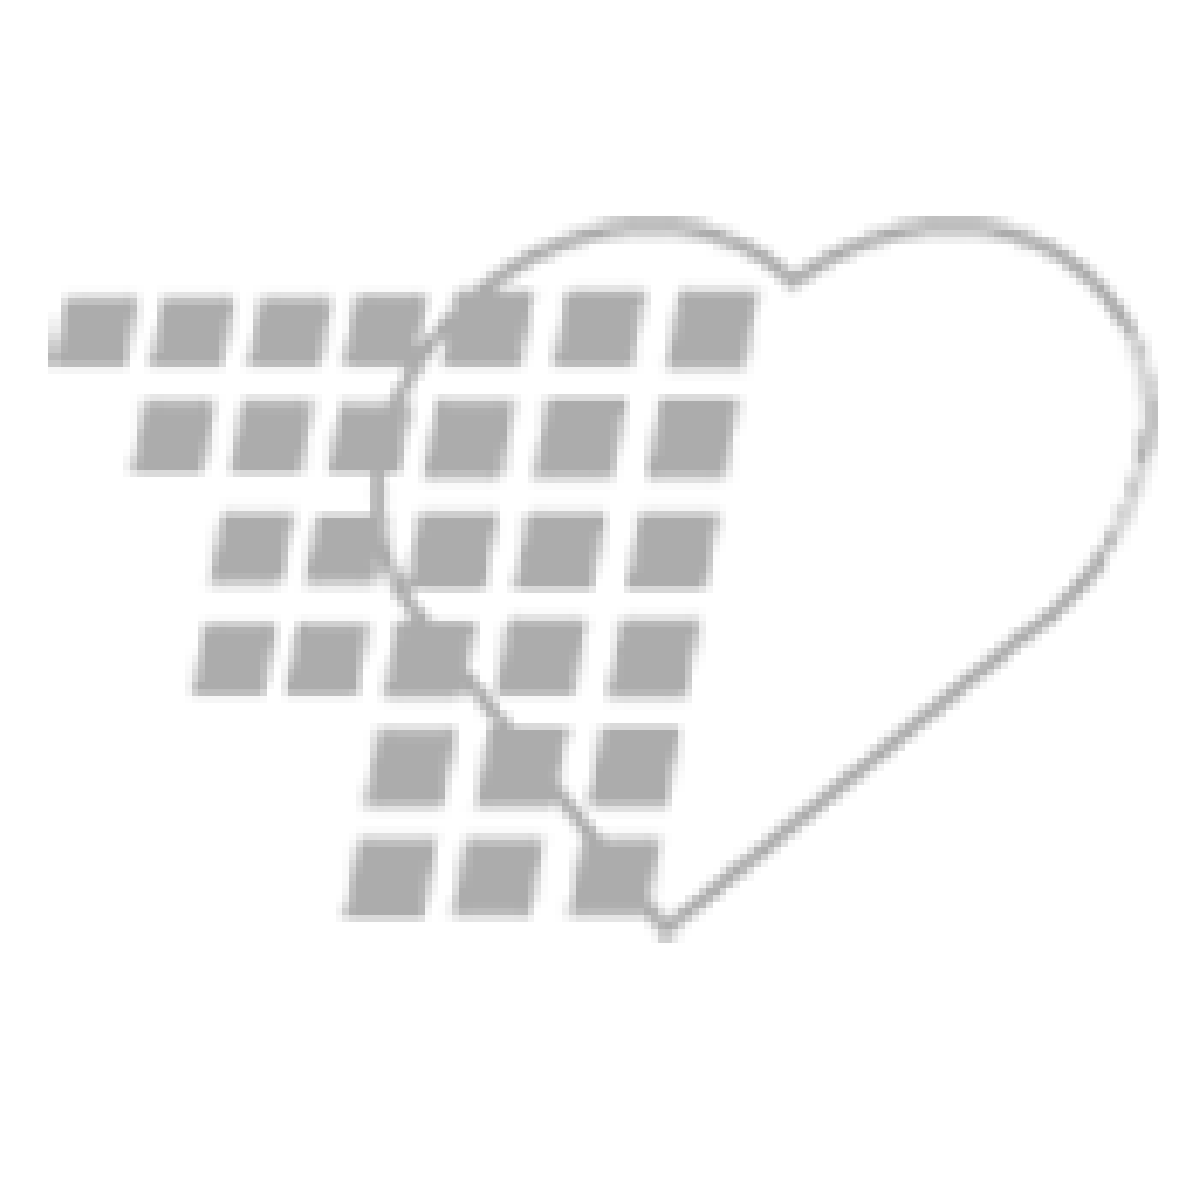 12-81-1009 ReaLifeSim IV Task Trainer without App